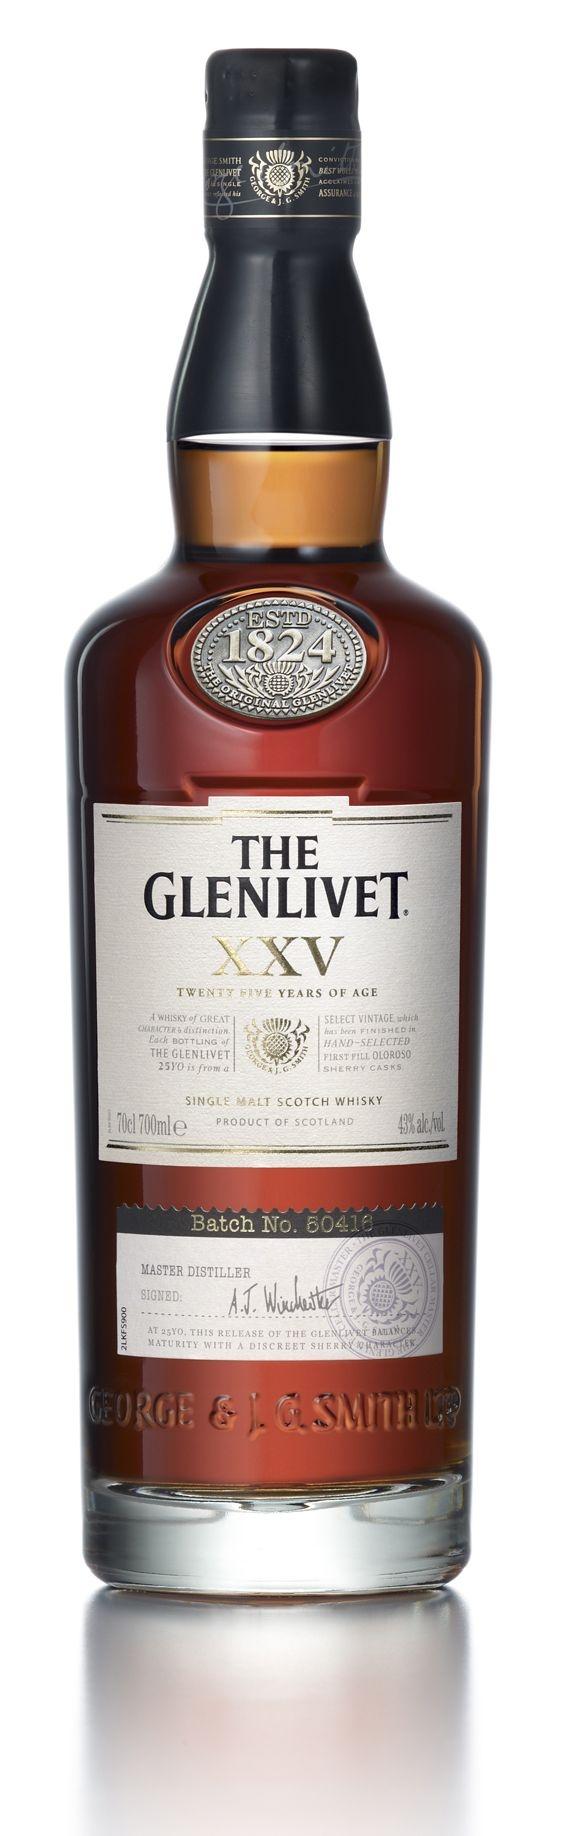 The Glenlivet XXV                                                                                                                                                                                 Más